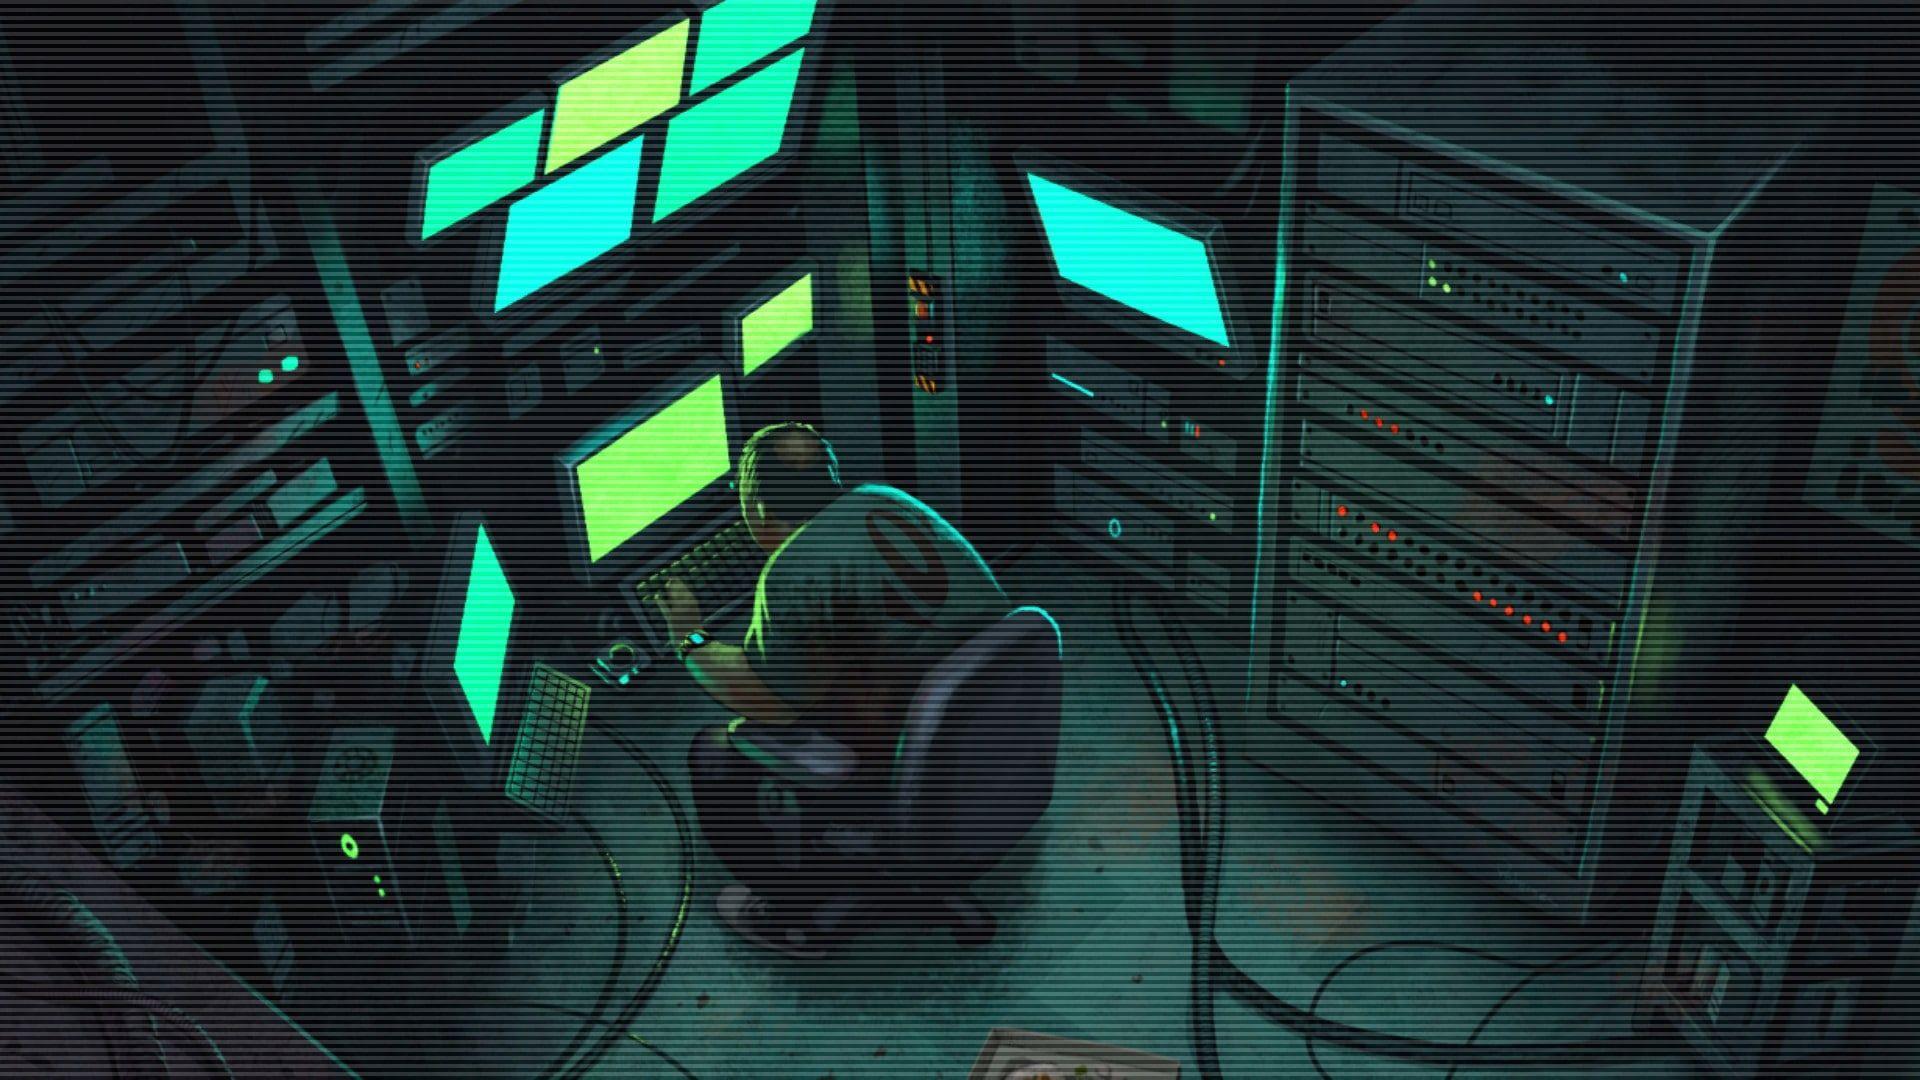 Hacking Computer 1080p Wallpaper Hdwallpaper Desktop